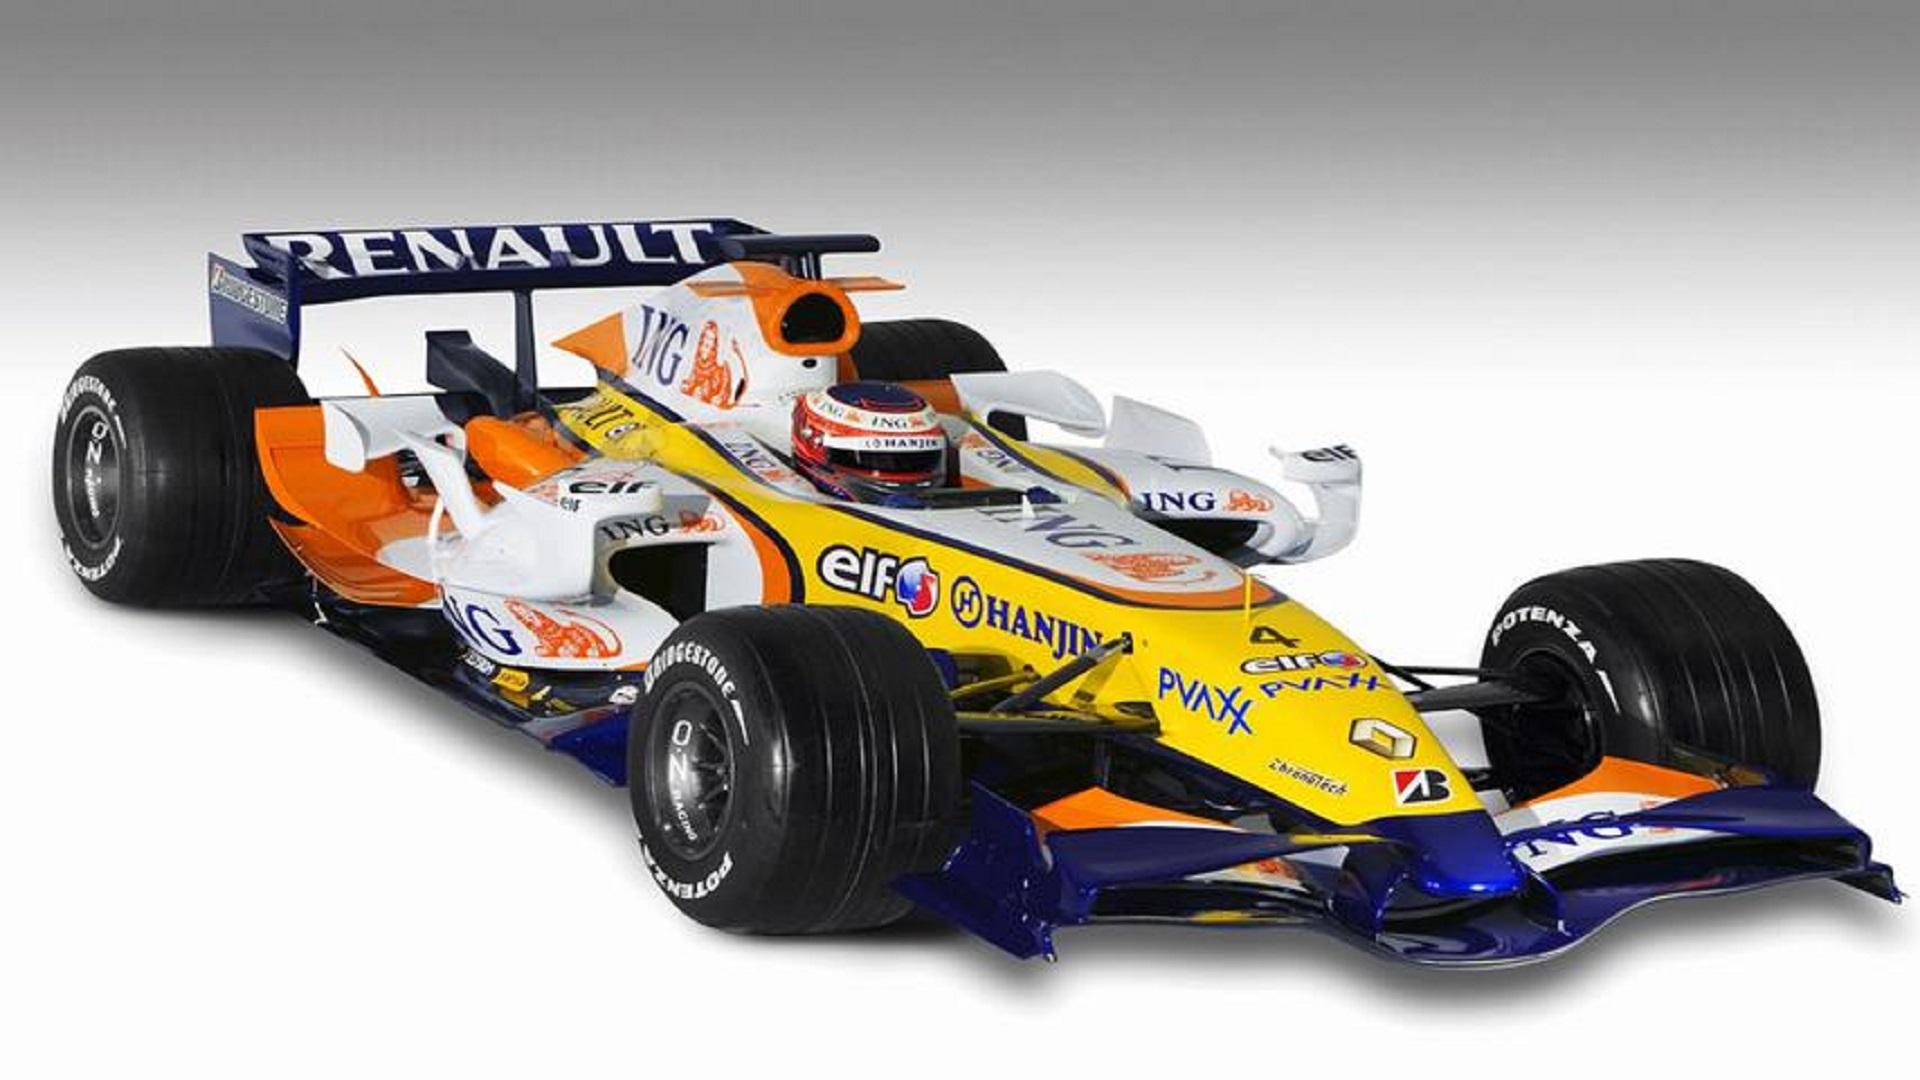 Cool racing cars wallpapers -free-hd-for-desktop